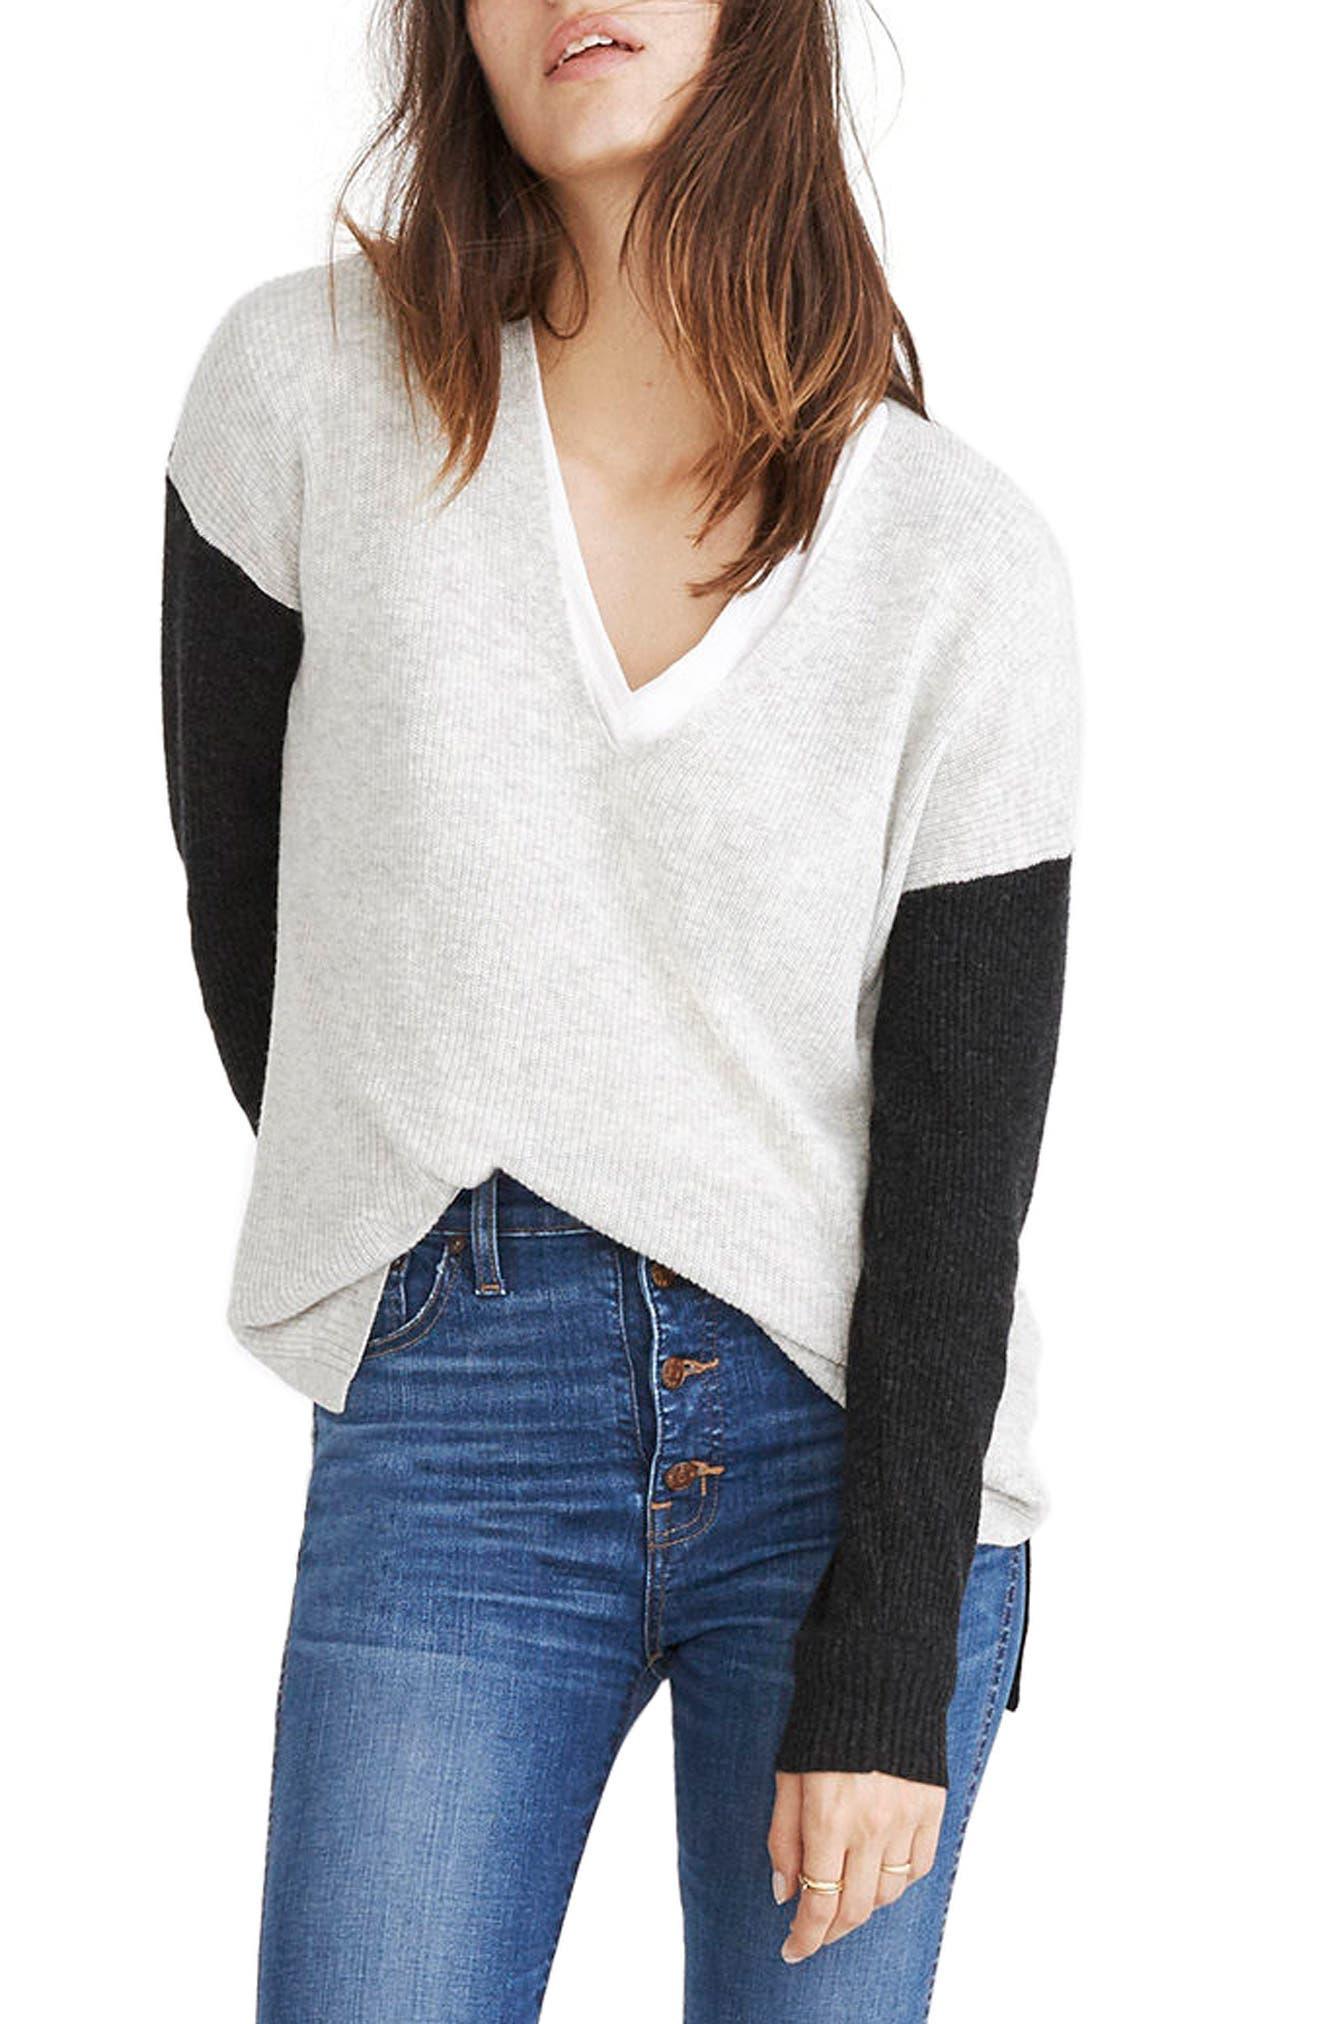 Warmlight Colorblock V-Neck Sweater,                             Main thumbnail 1, color,                             090